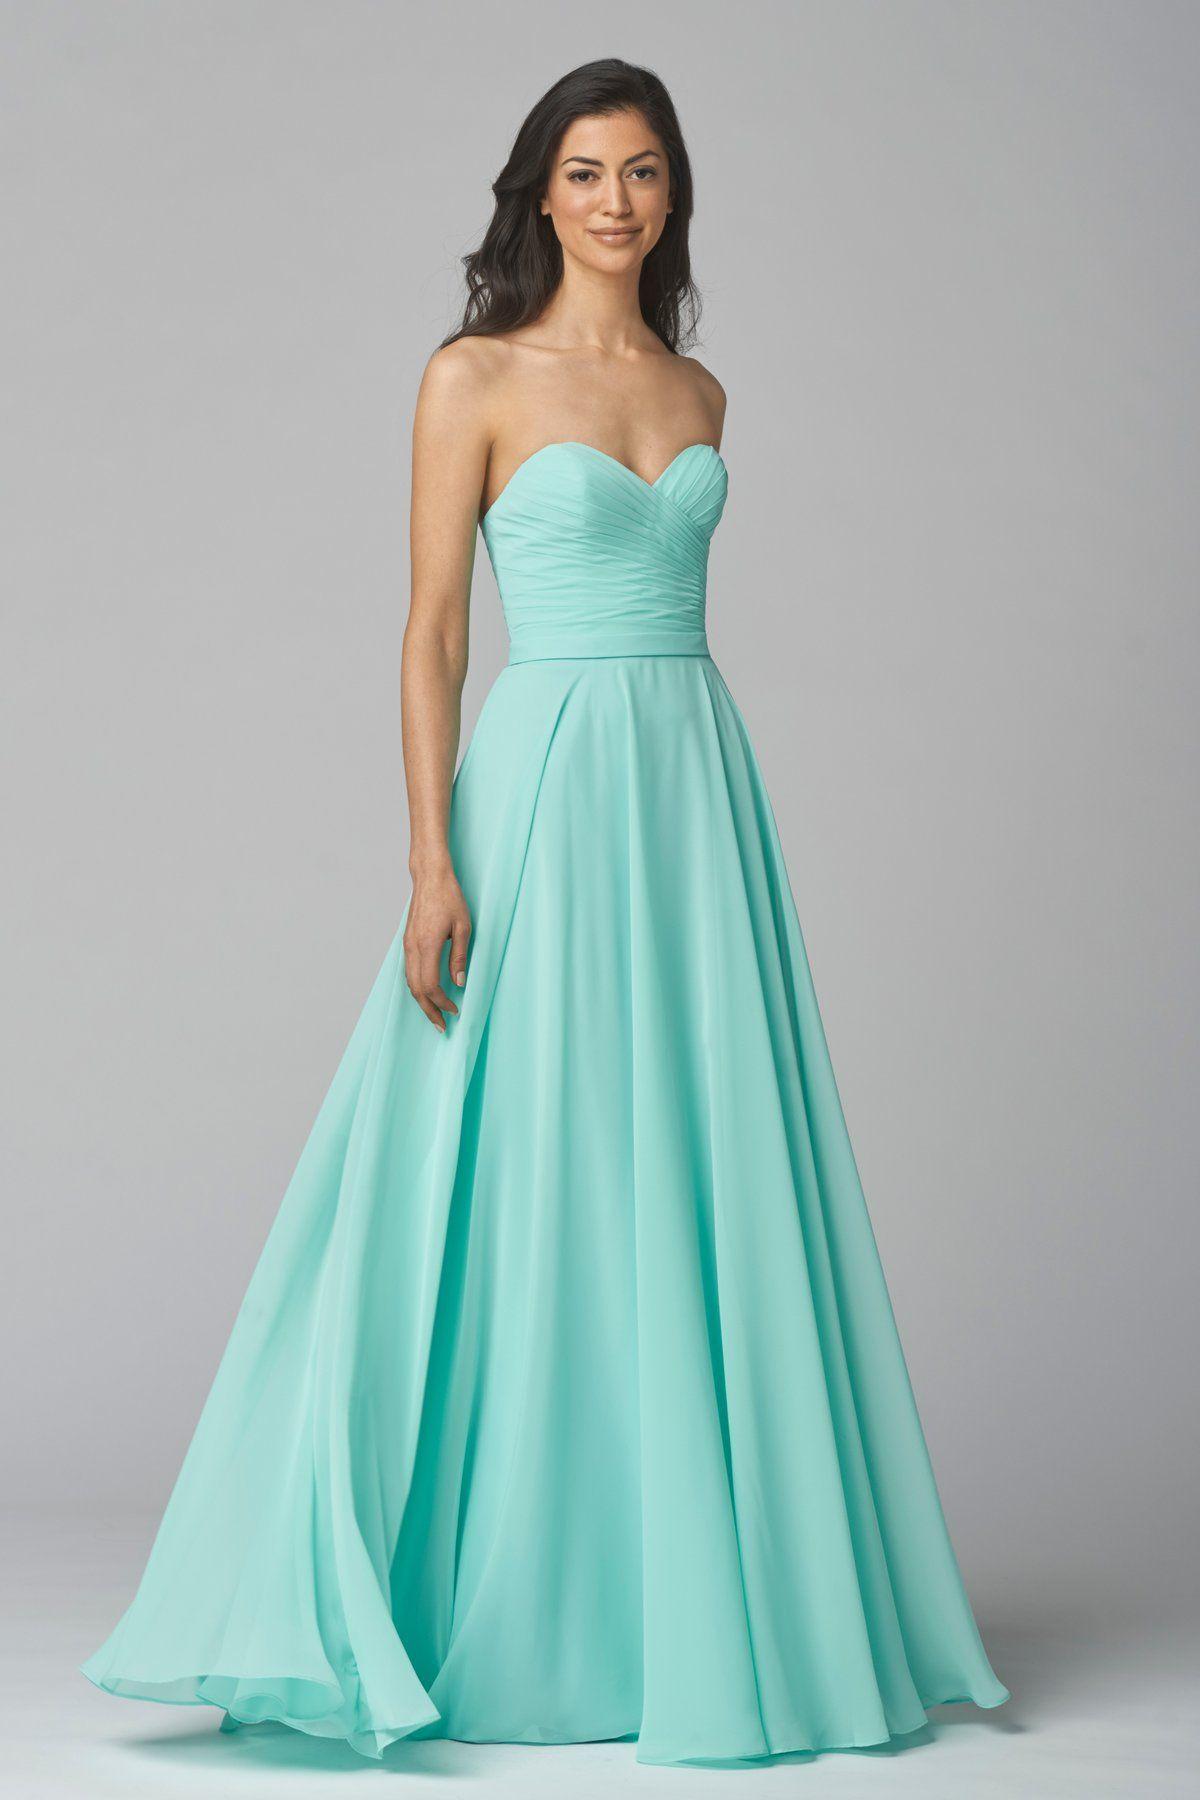 Wtoo Maids Dress 903 | MILLS/BOUFFARD WEDDING | Pinterest